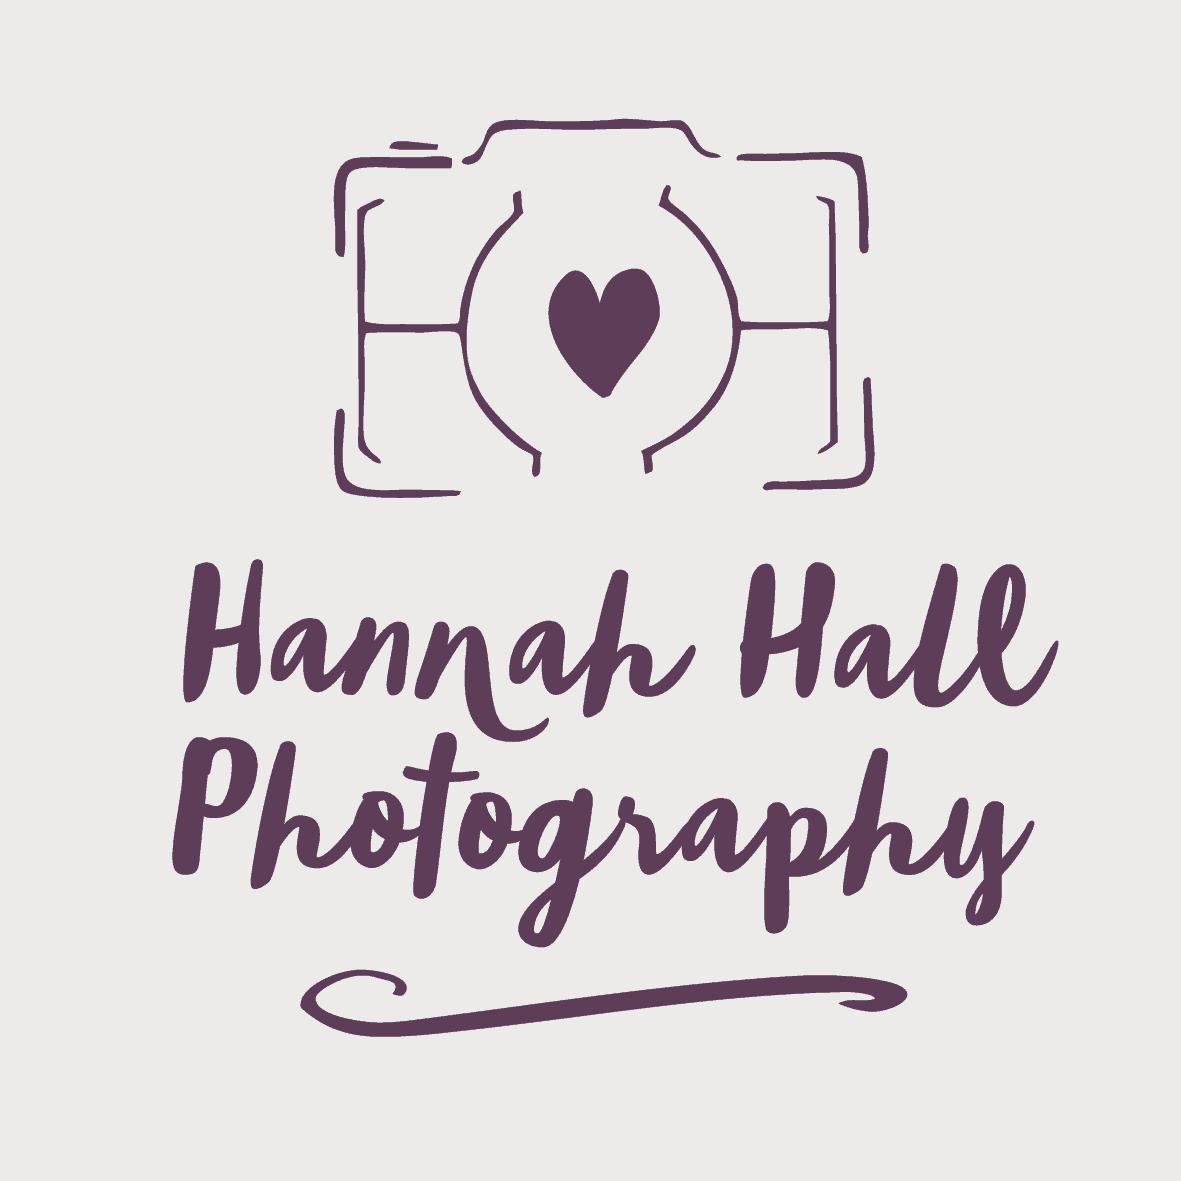 Meet Hannah Hall Photography at The Sami Tipi Autumn Open Weekend 2016